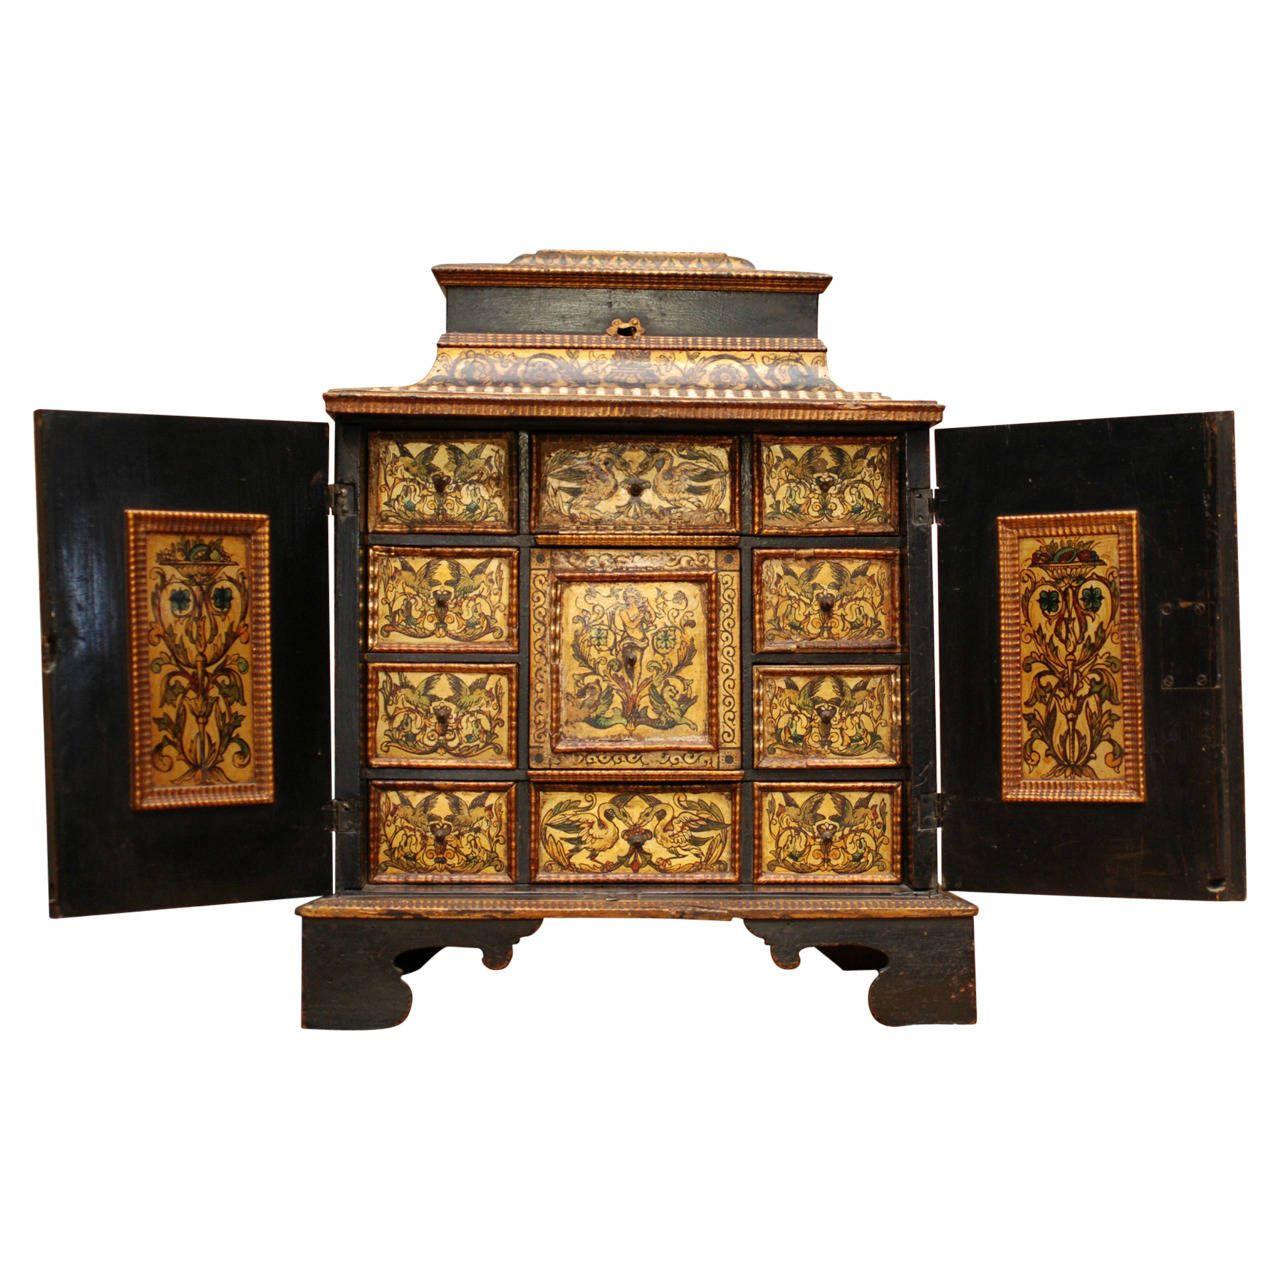 Small Italian 17th Century Cabinet Cajas # Muebles Boj Gijon